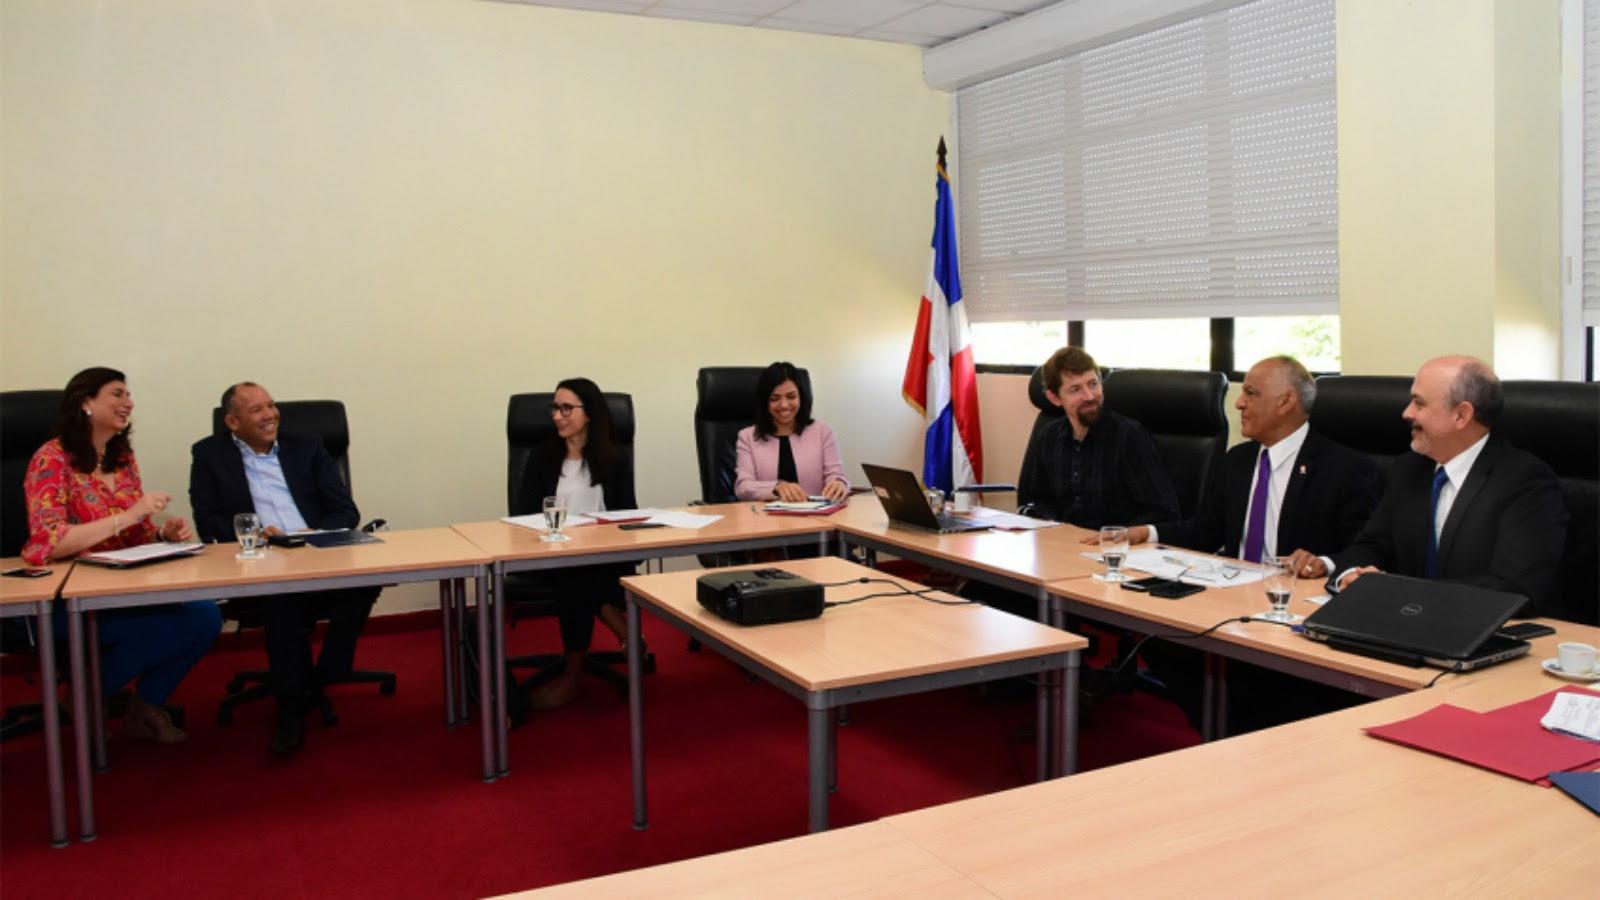 , República Dominicana es presentada como modelo en programa de VIH